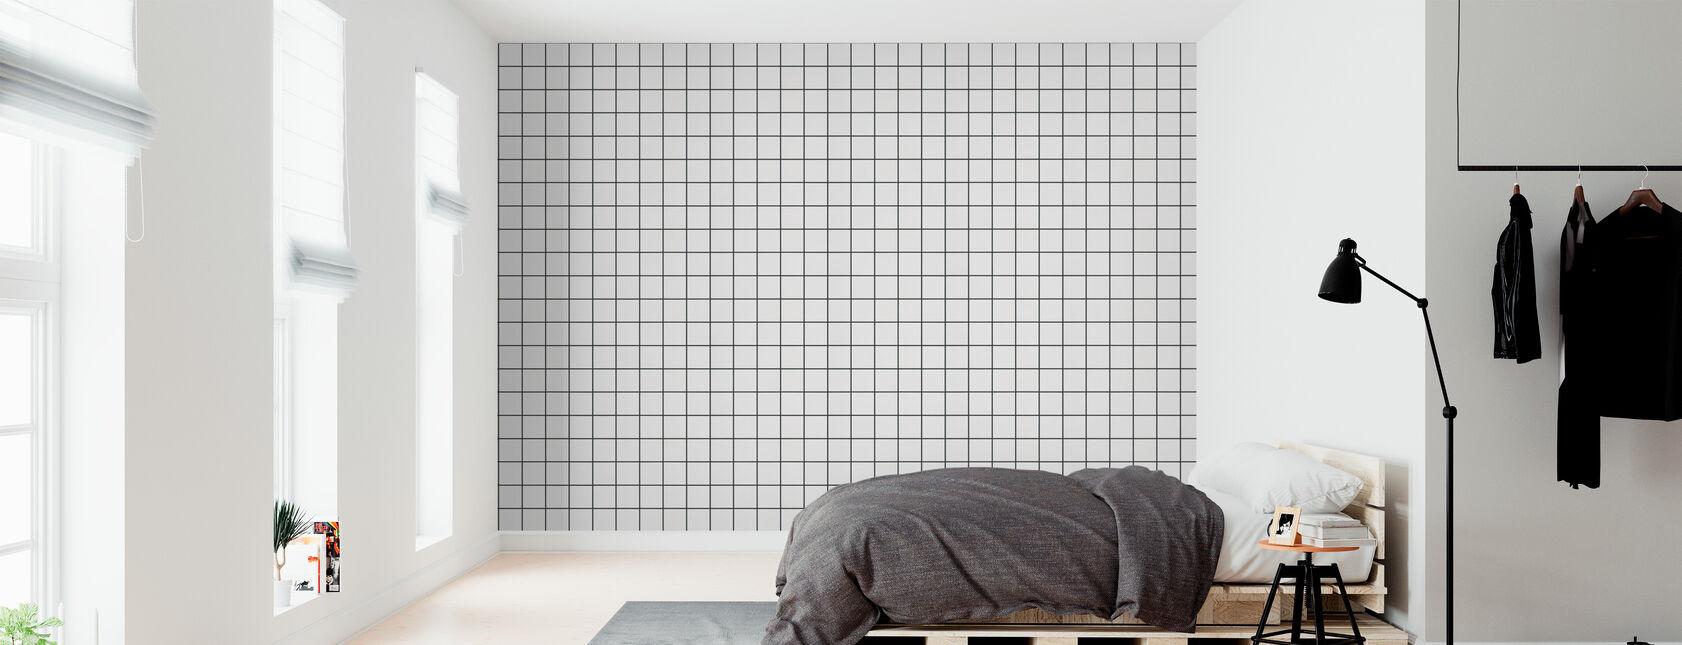 White Ceramic Tiles - 10x10 Antracit Seam - Wallpaper - Bedroom